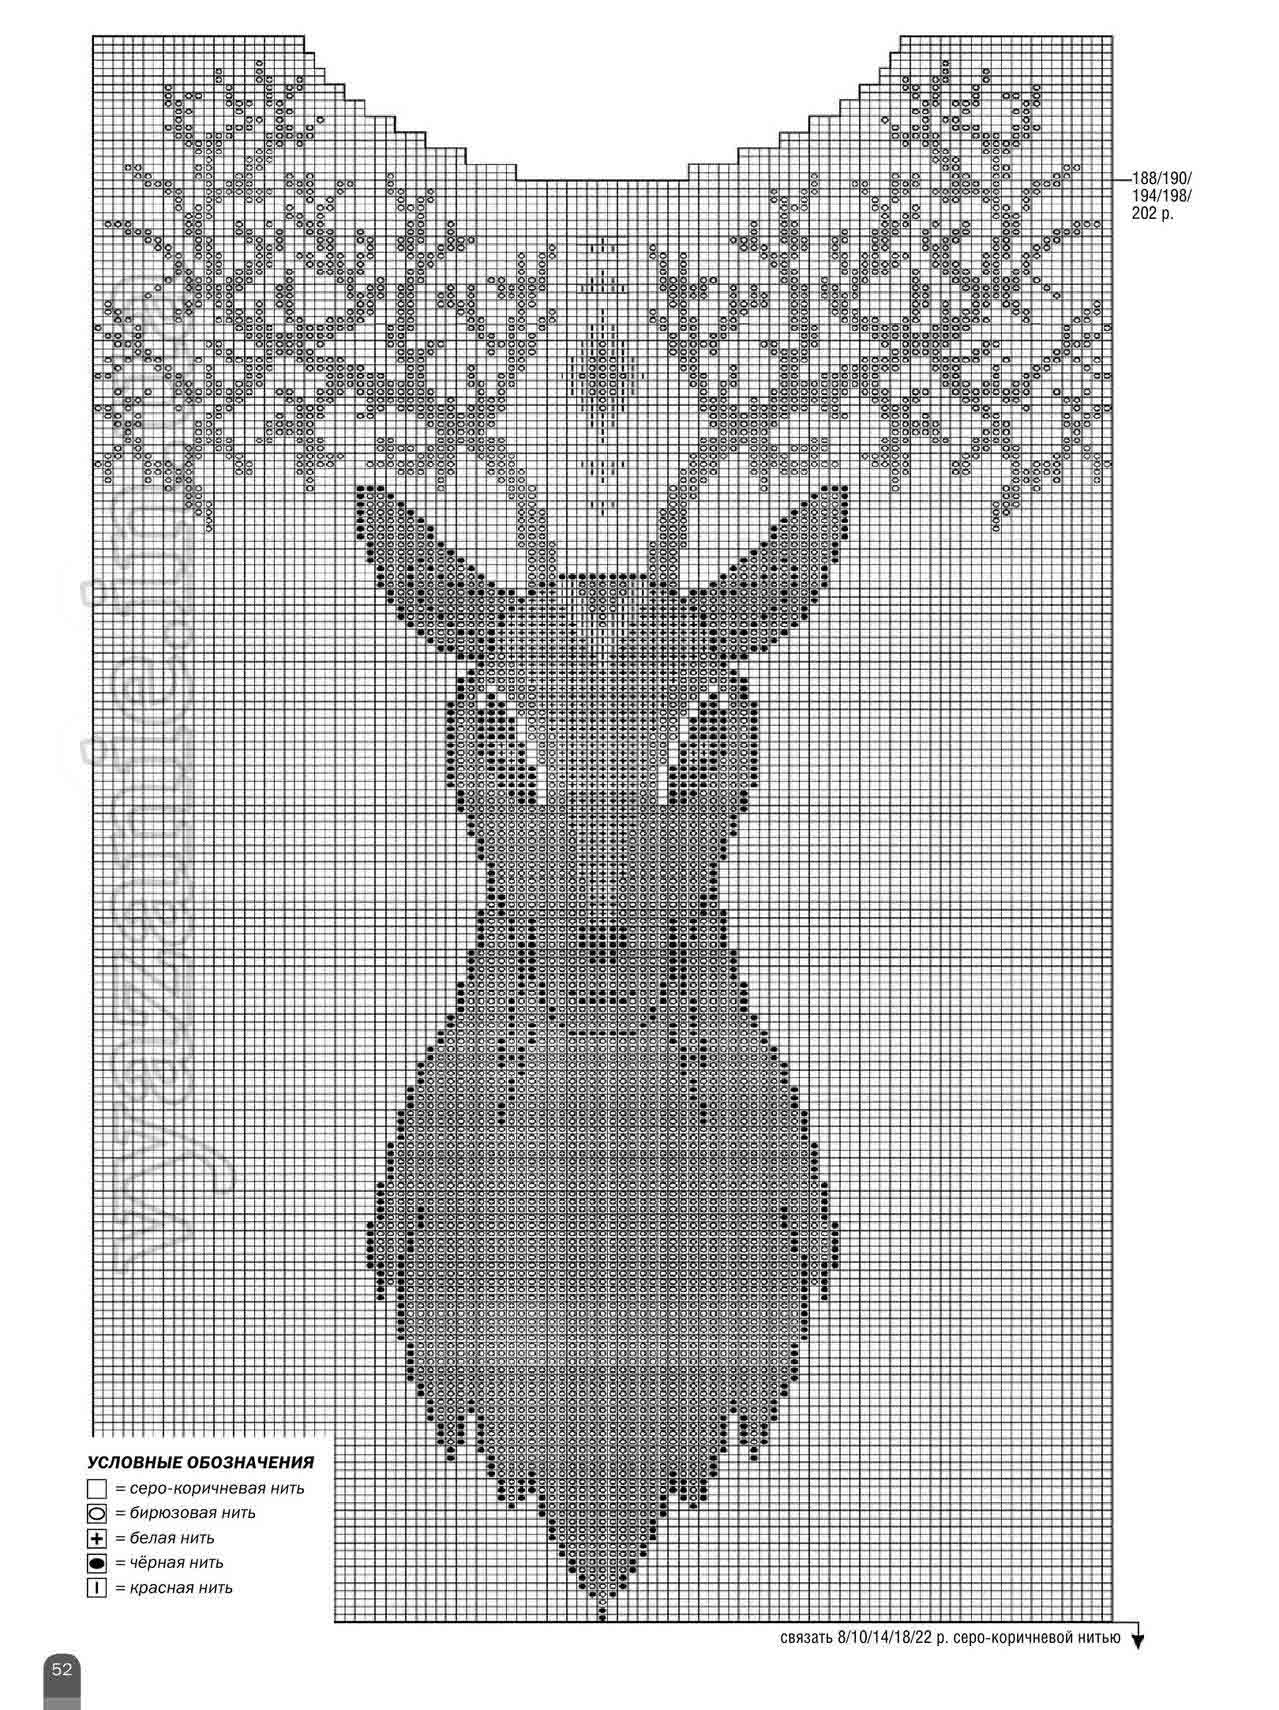 Свитер с оленями схема вязания спицами фото 128